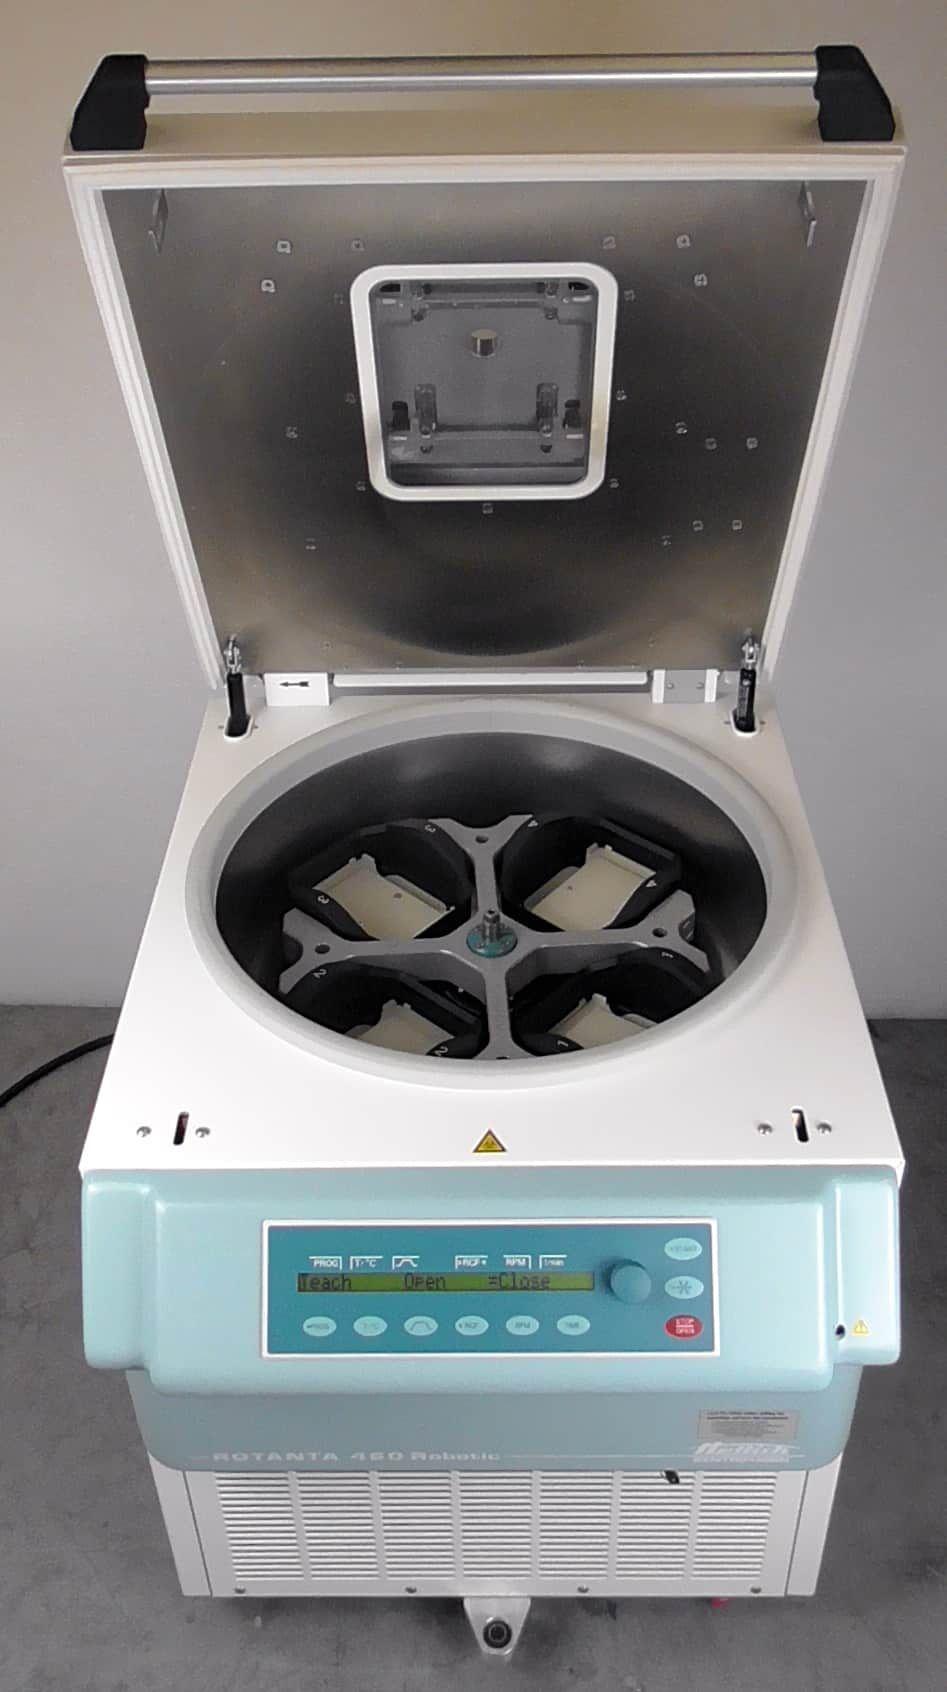 Hettich Rotanta 460 Robotic Refrigerated Centrifuge